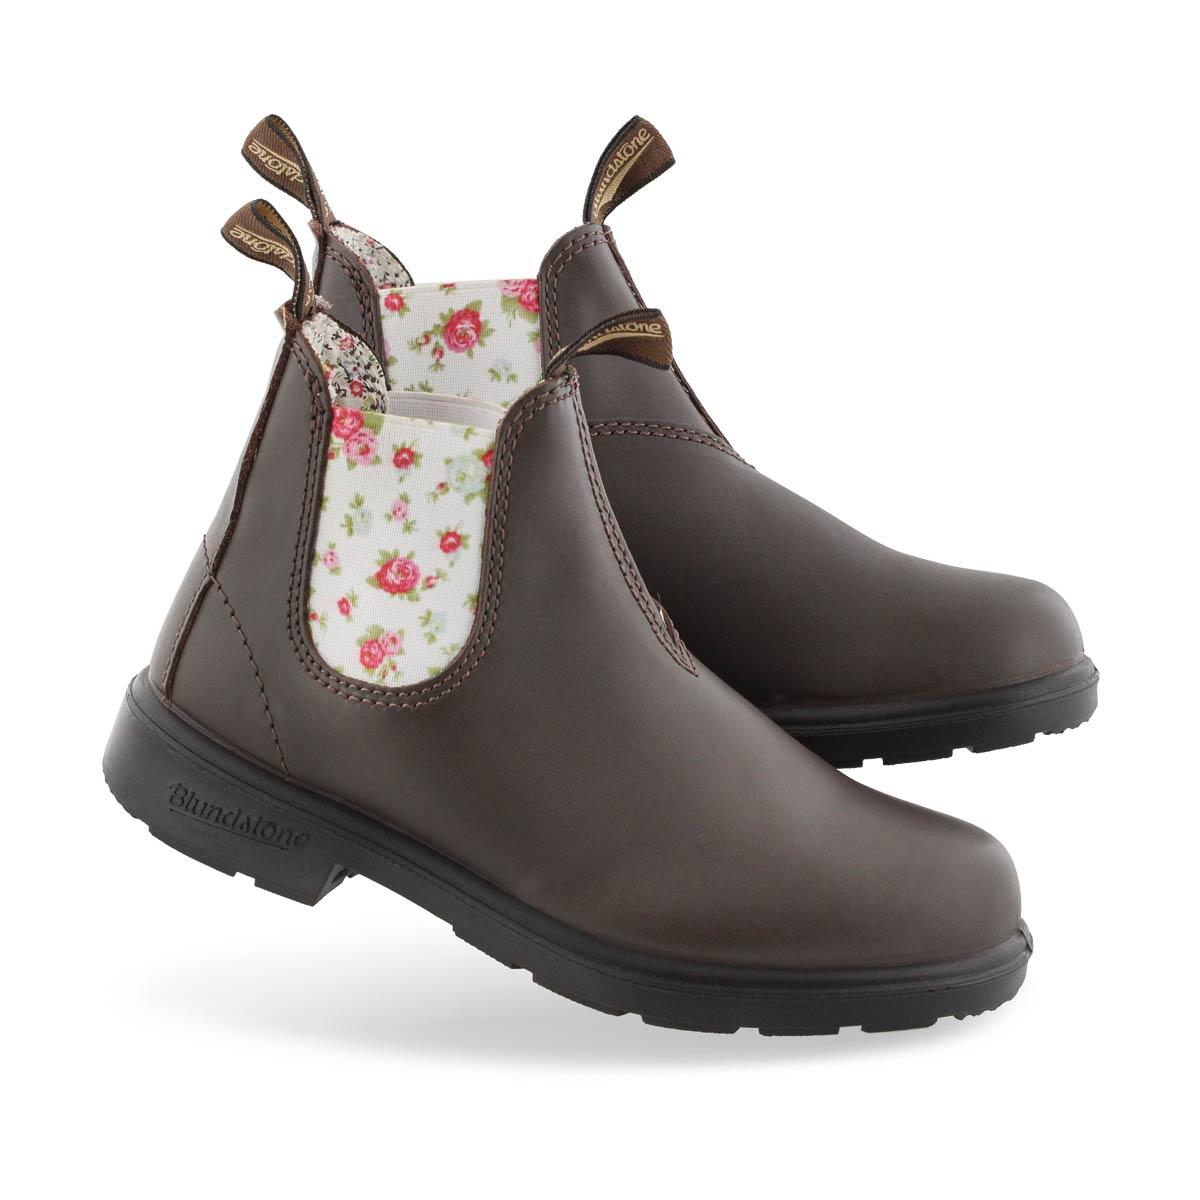 Kids Blunnies brn/floral twin gore boot